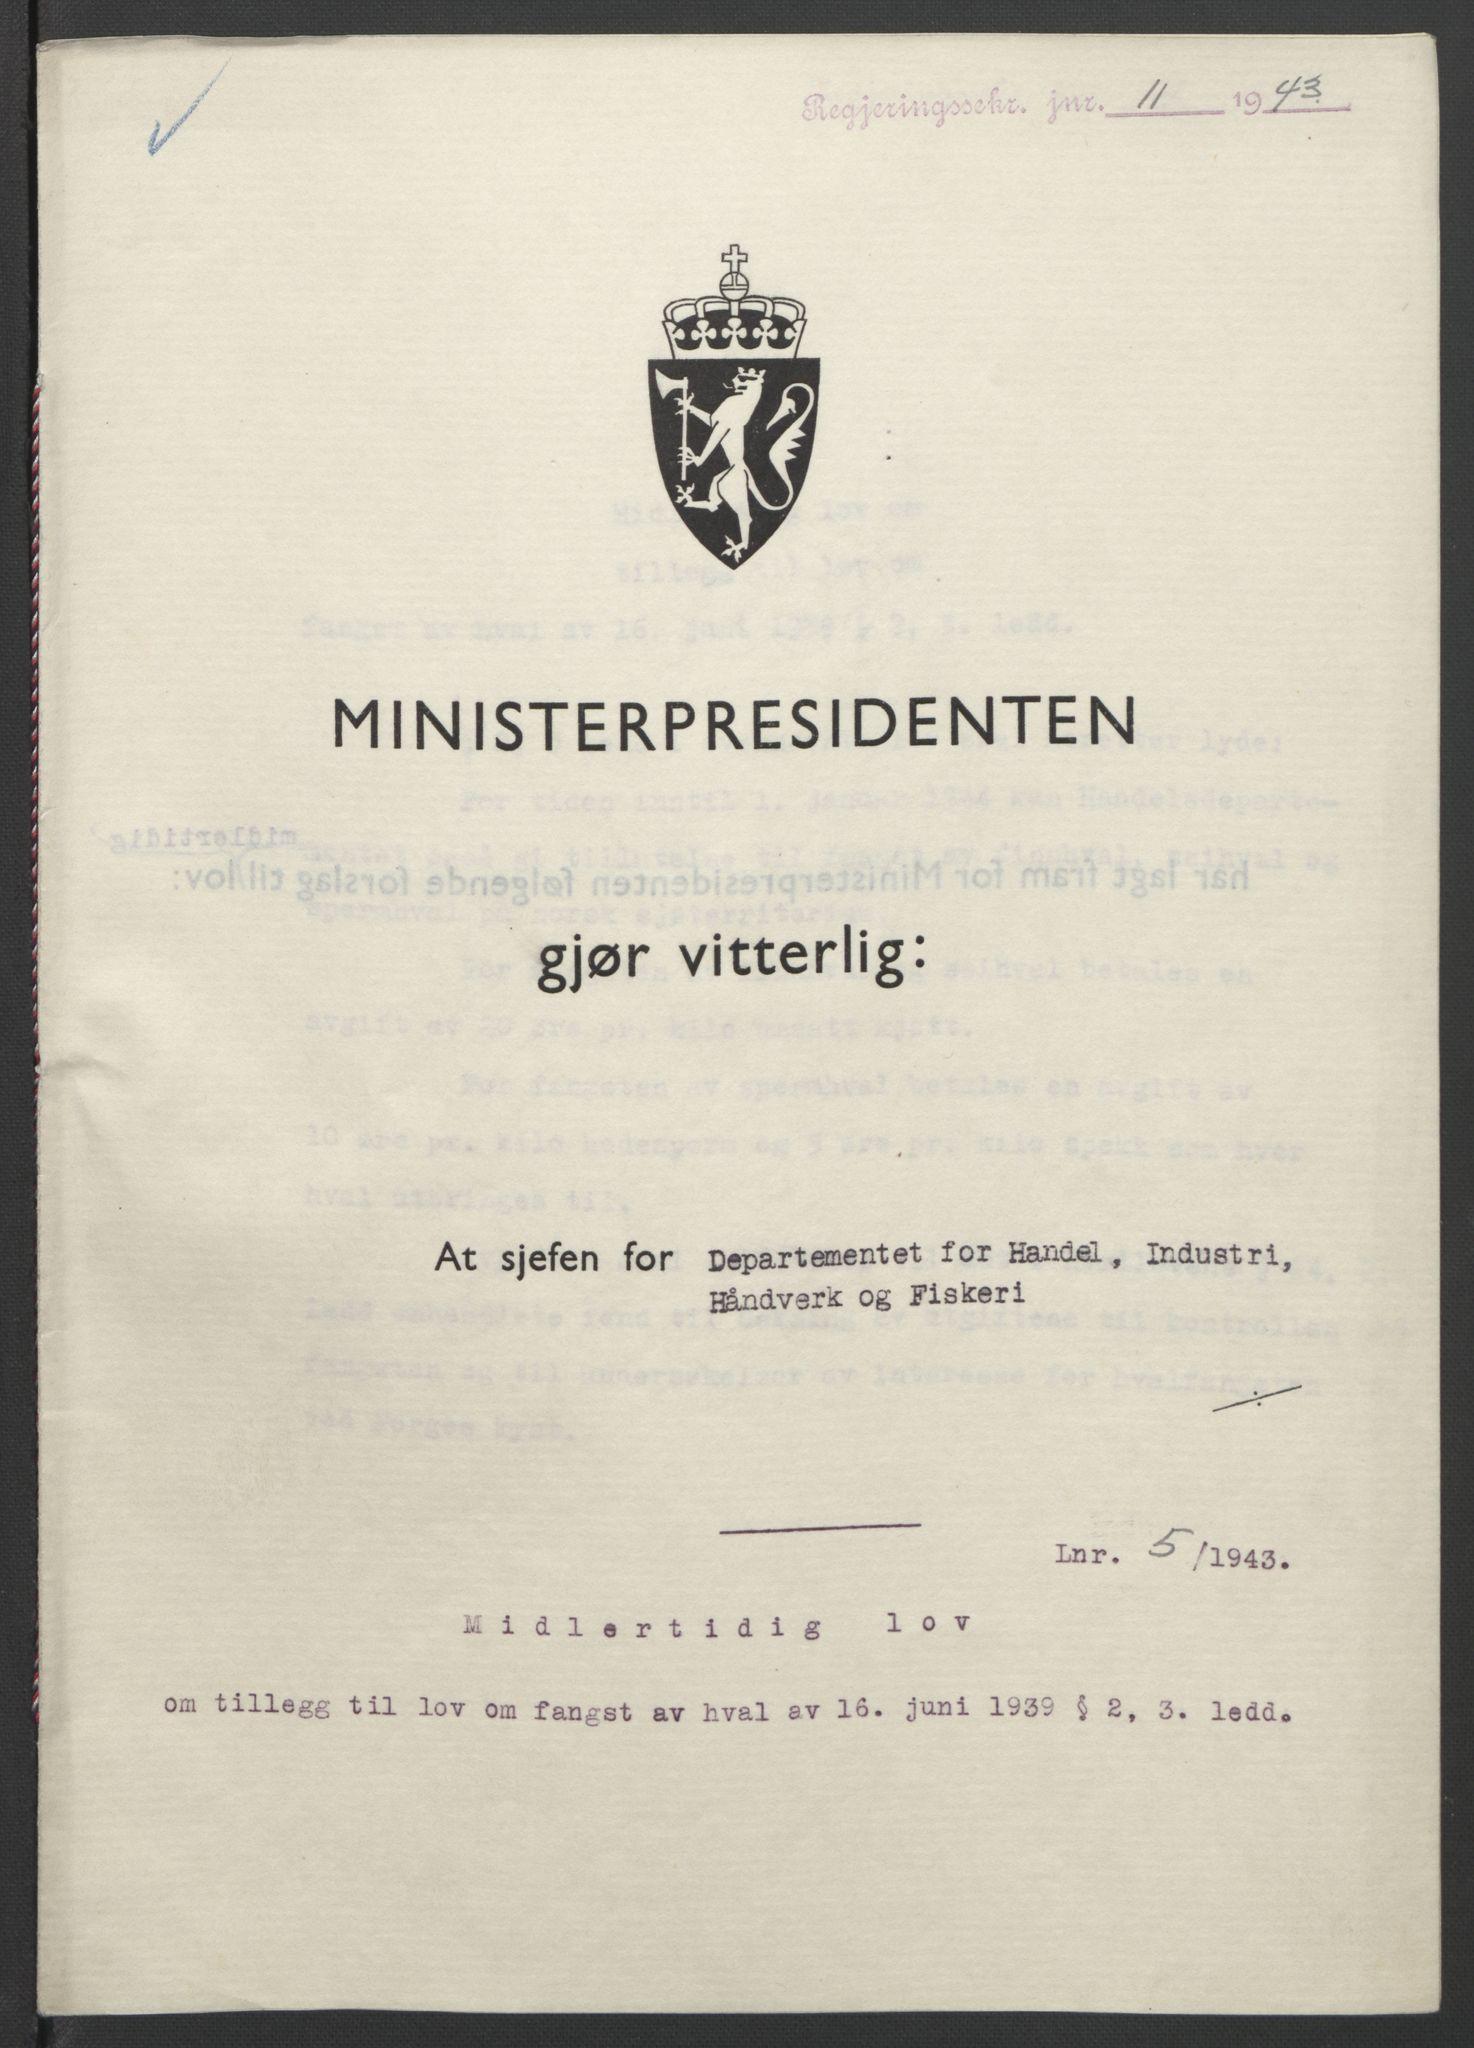 RA, NS-administrasjonen 1940-1945 (Statsrådsekretariatet, de kommisariske statsråder mm), D/Db/L0099: Lover, 1943, s. 22